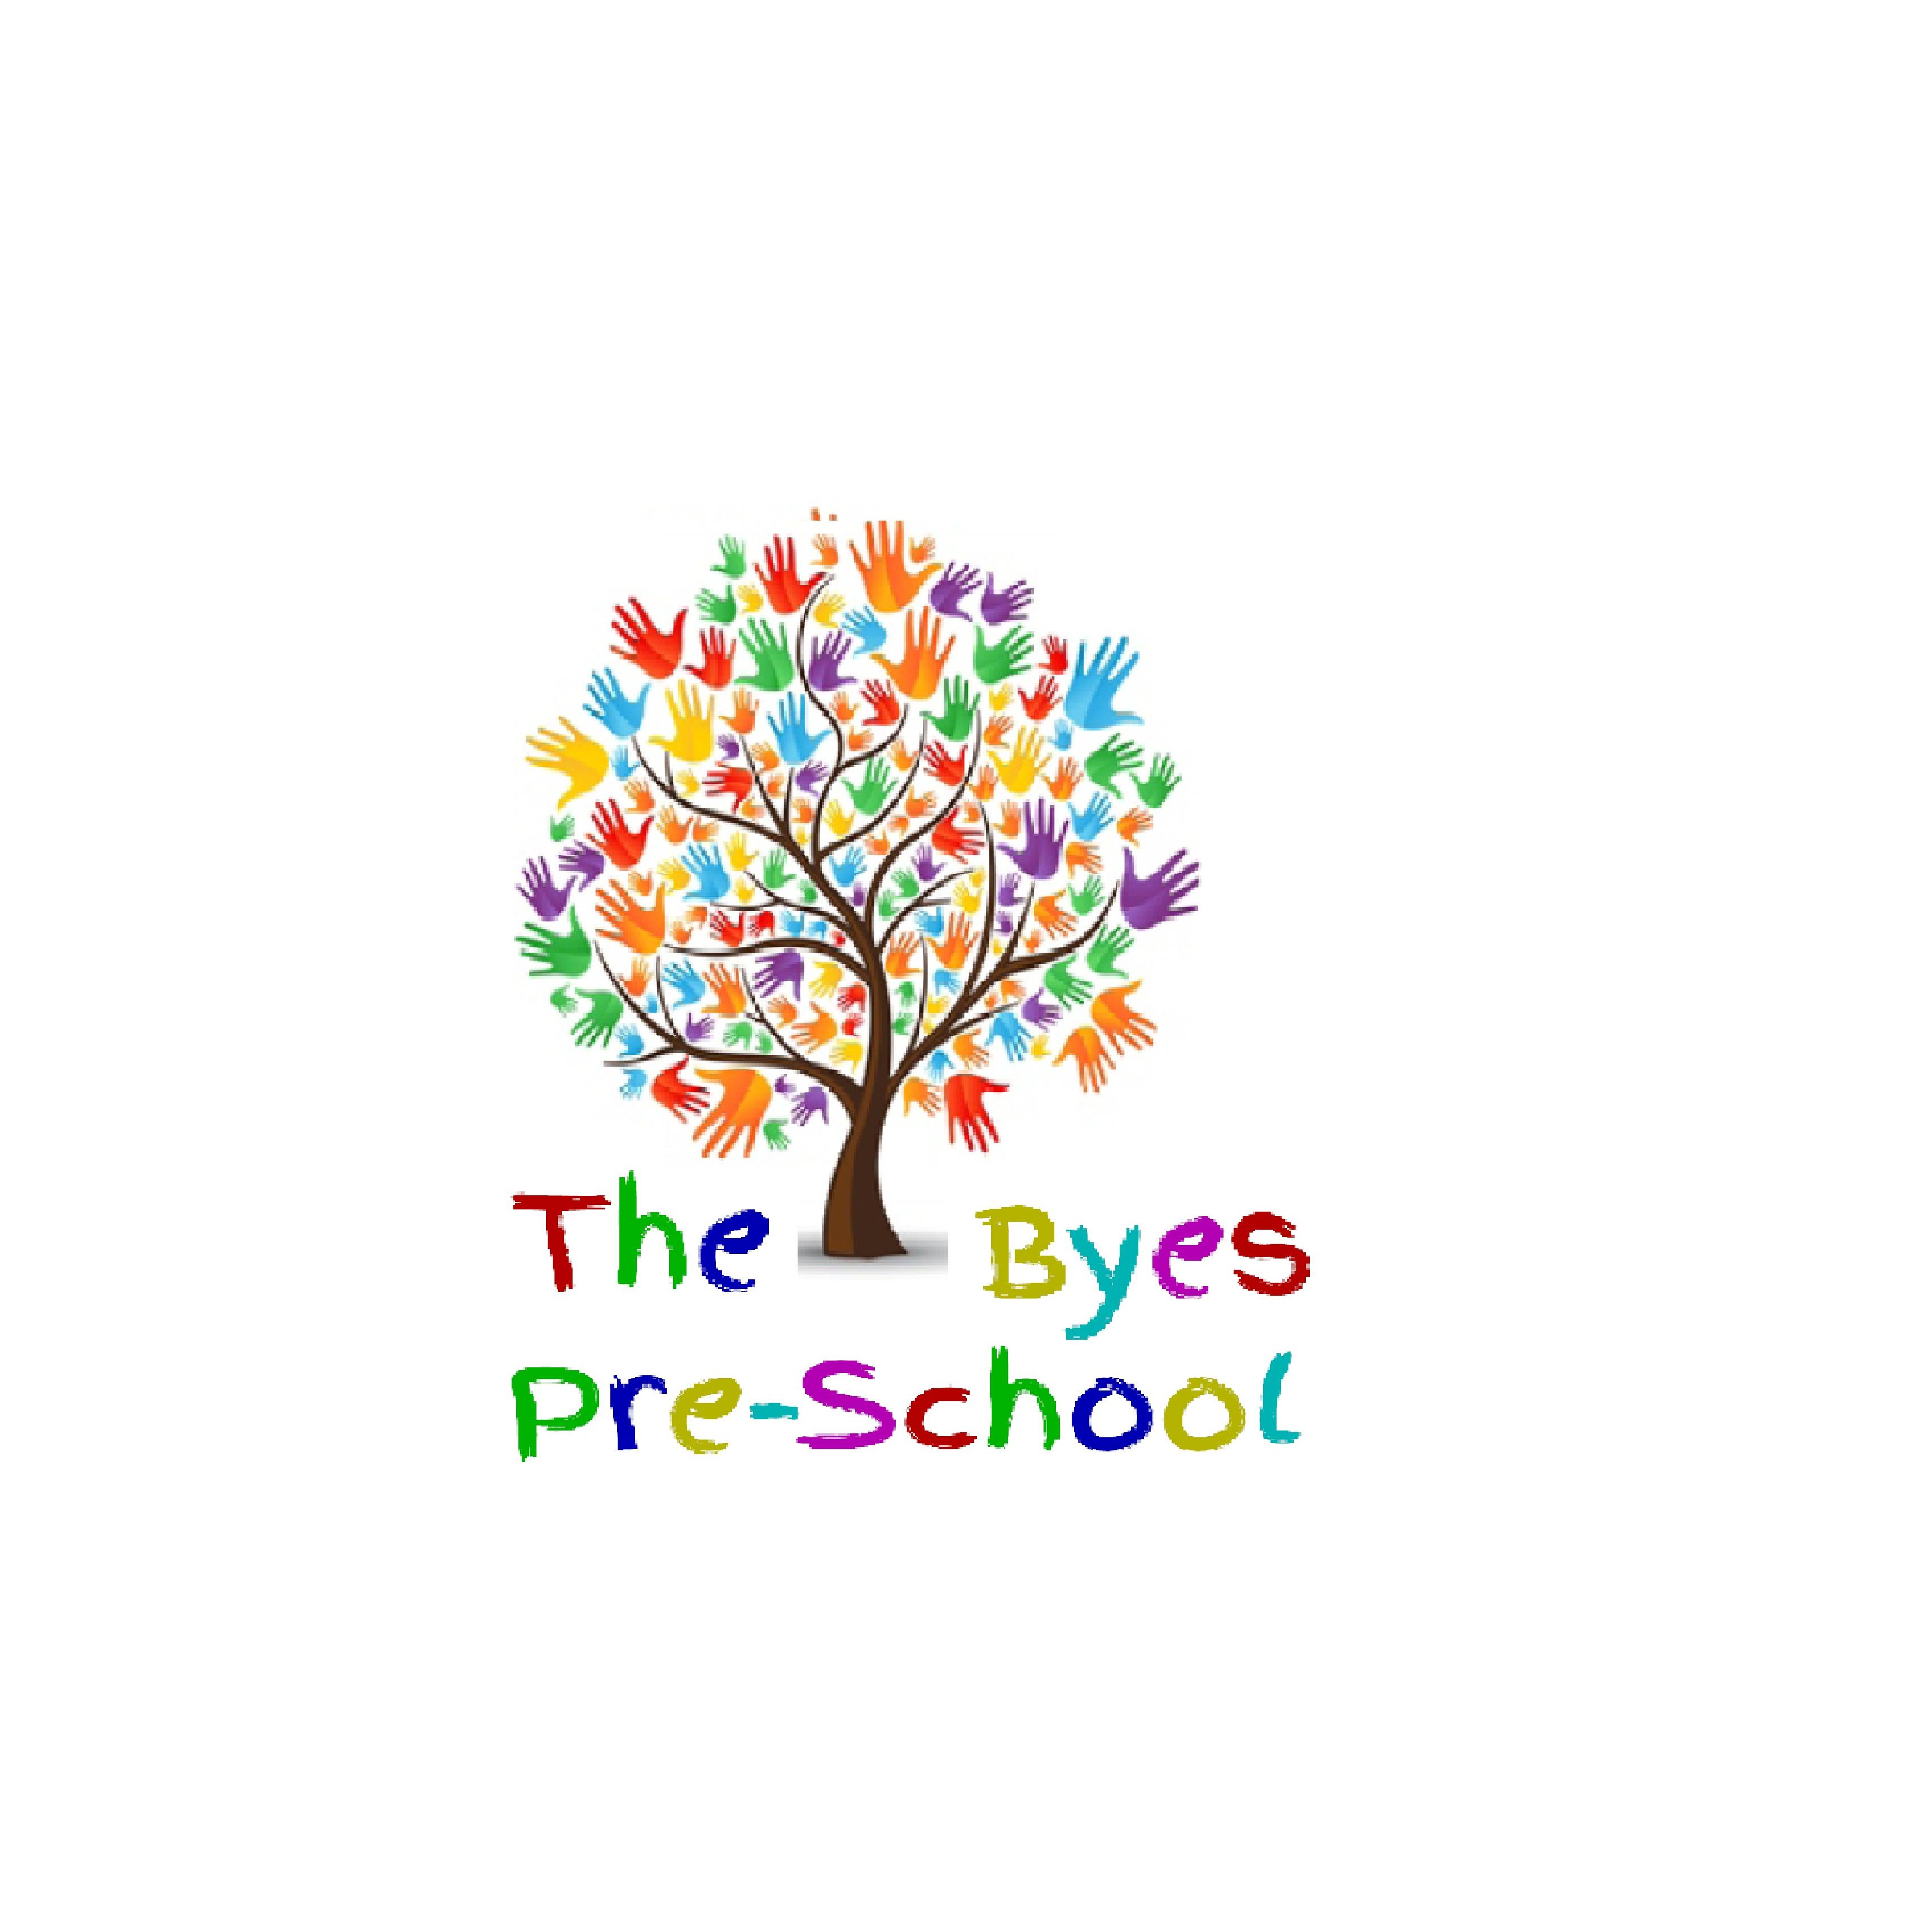 The Byes Pre-School